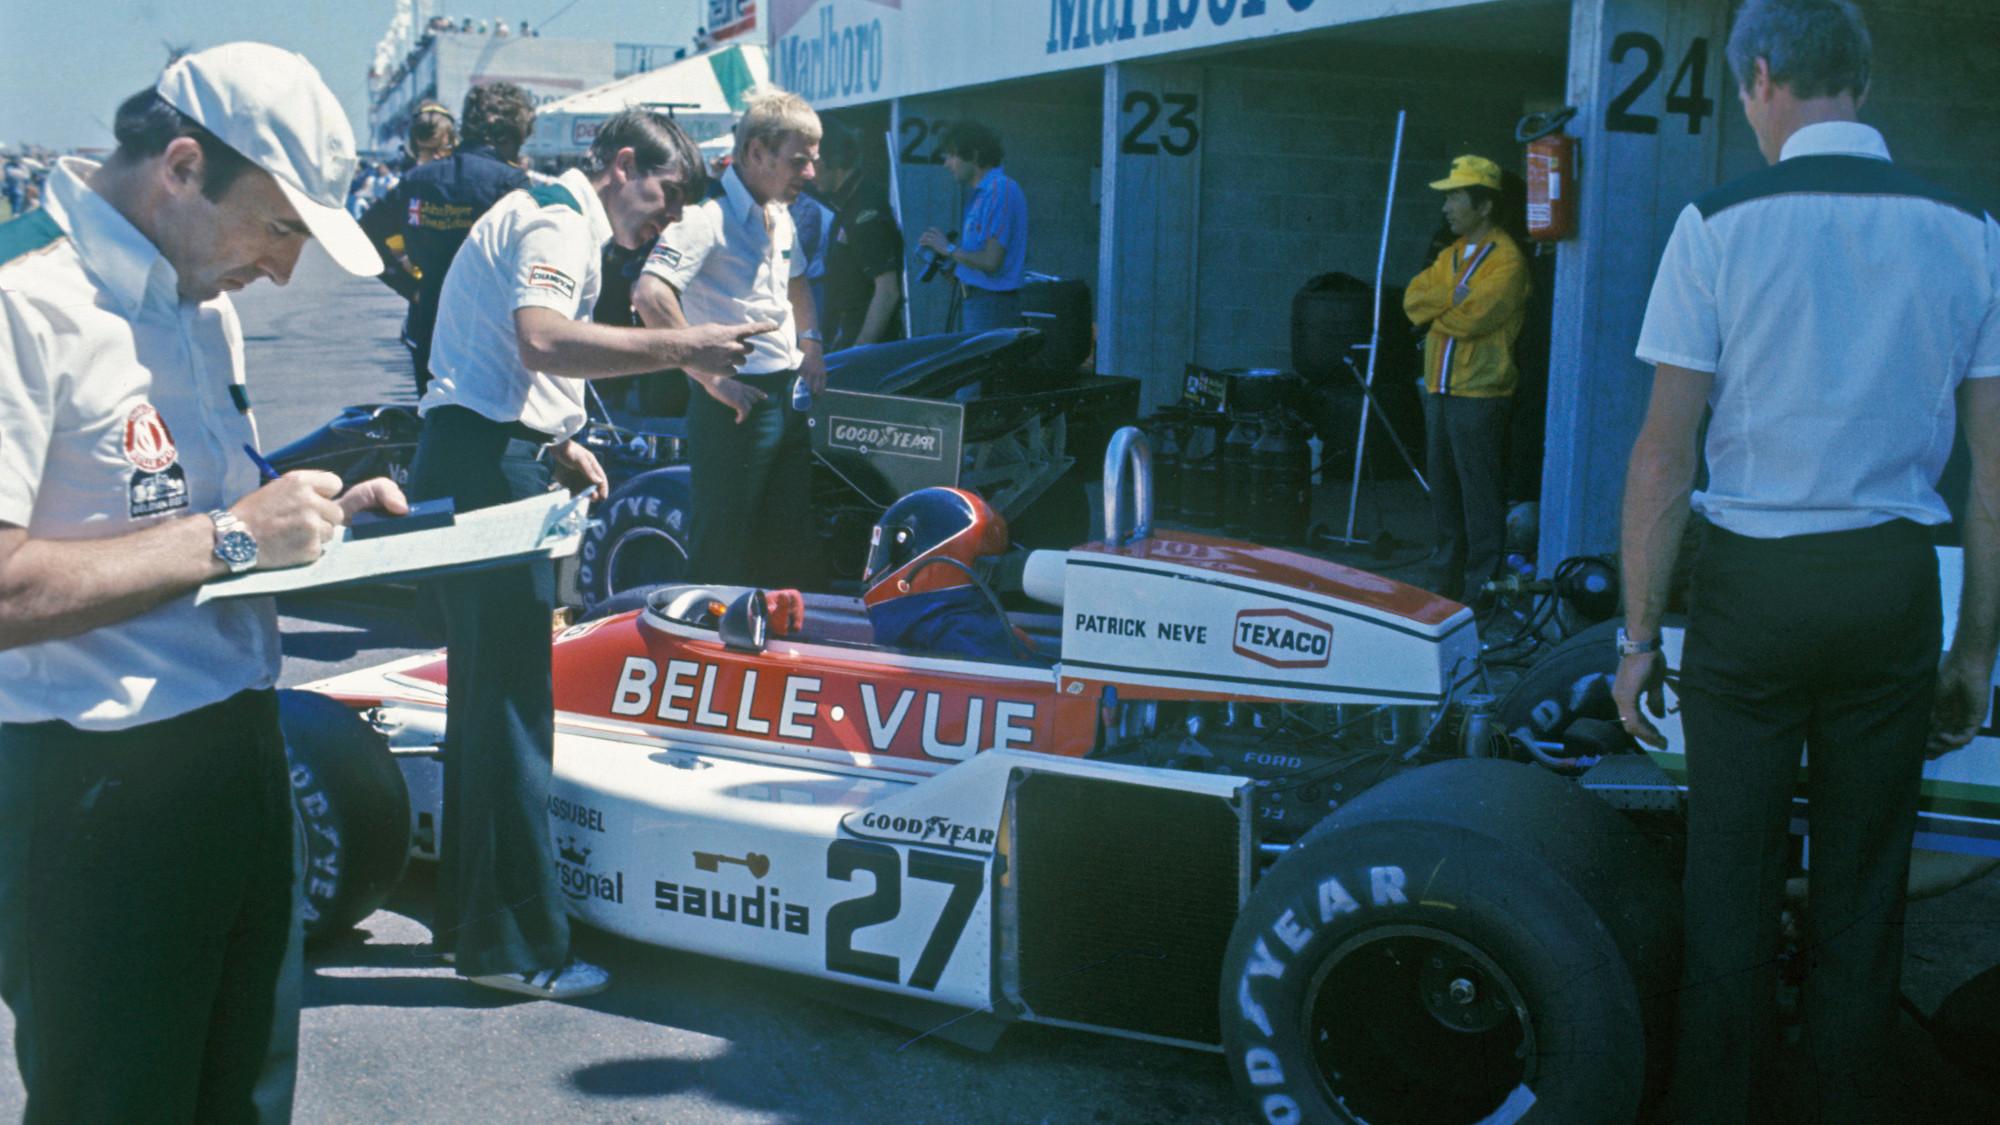 Williams, Patrick Neve, 1977